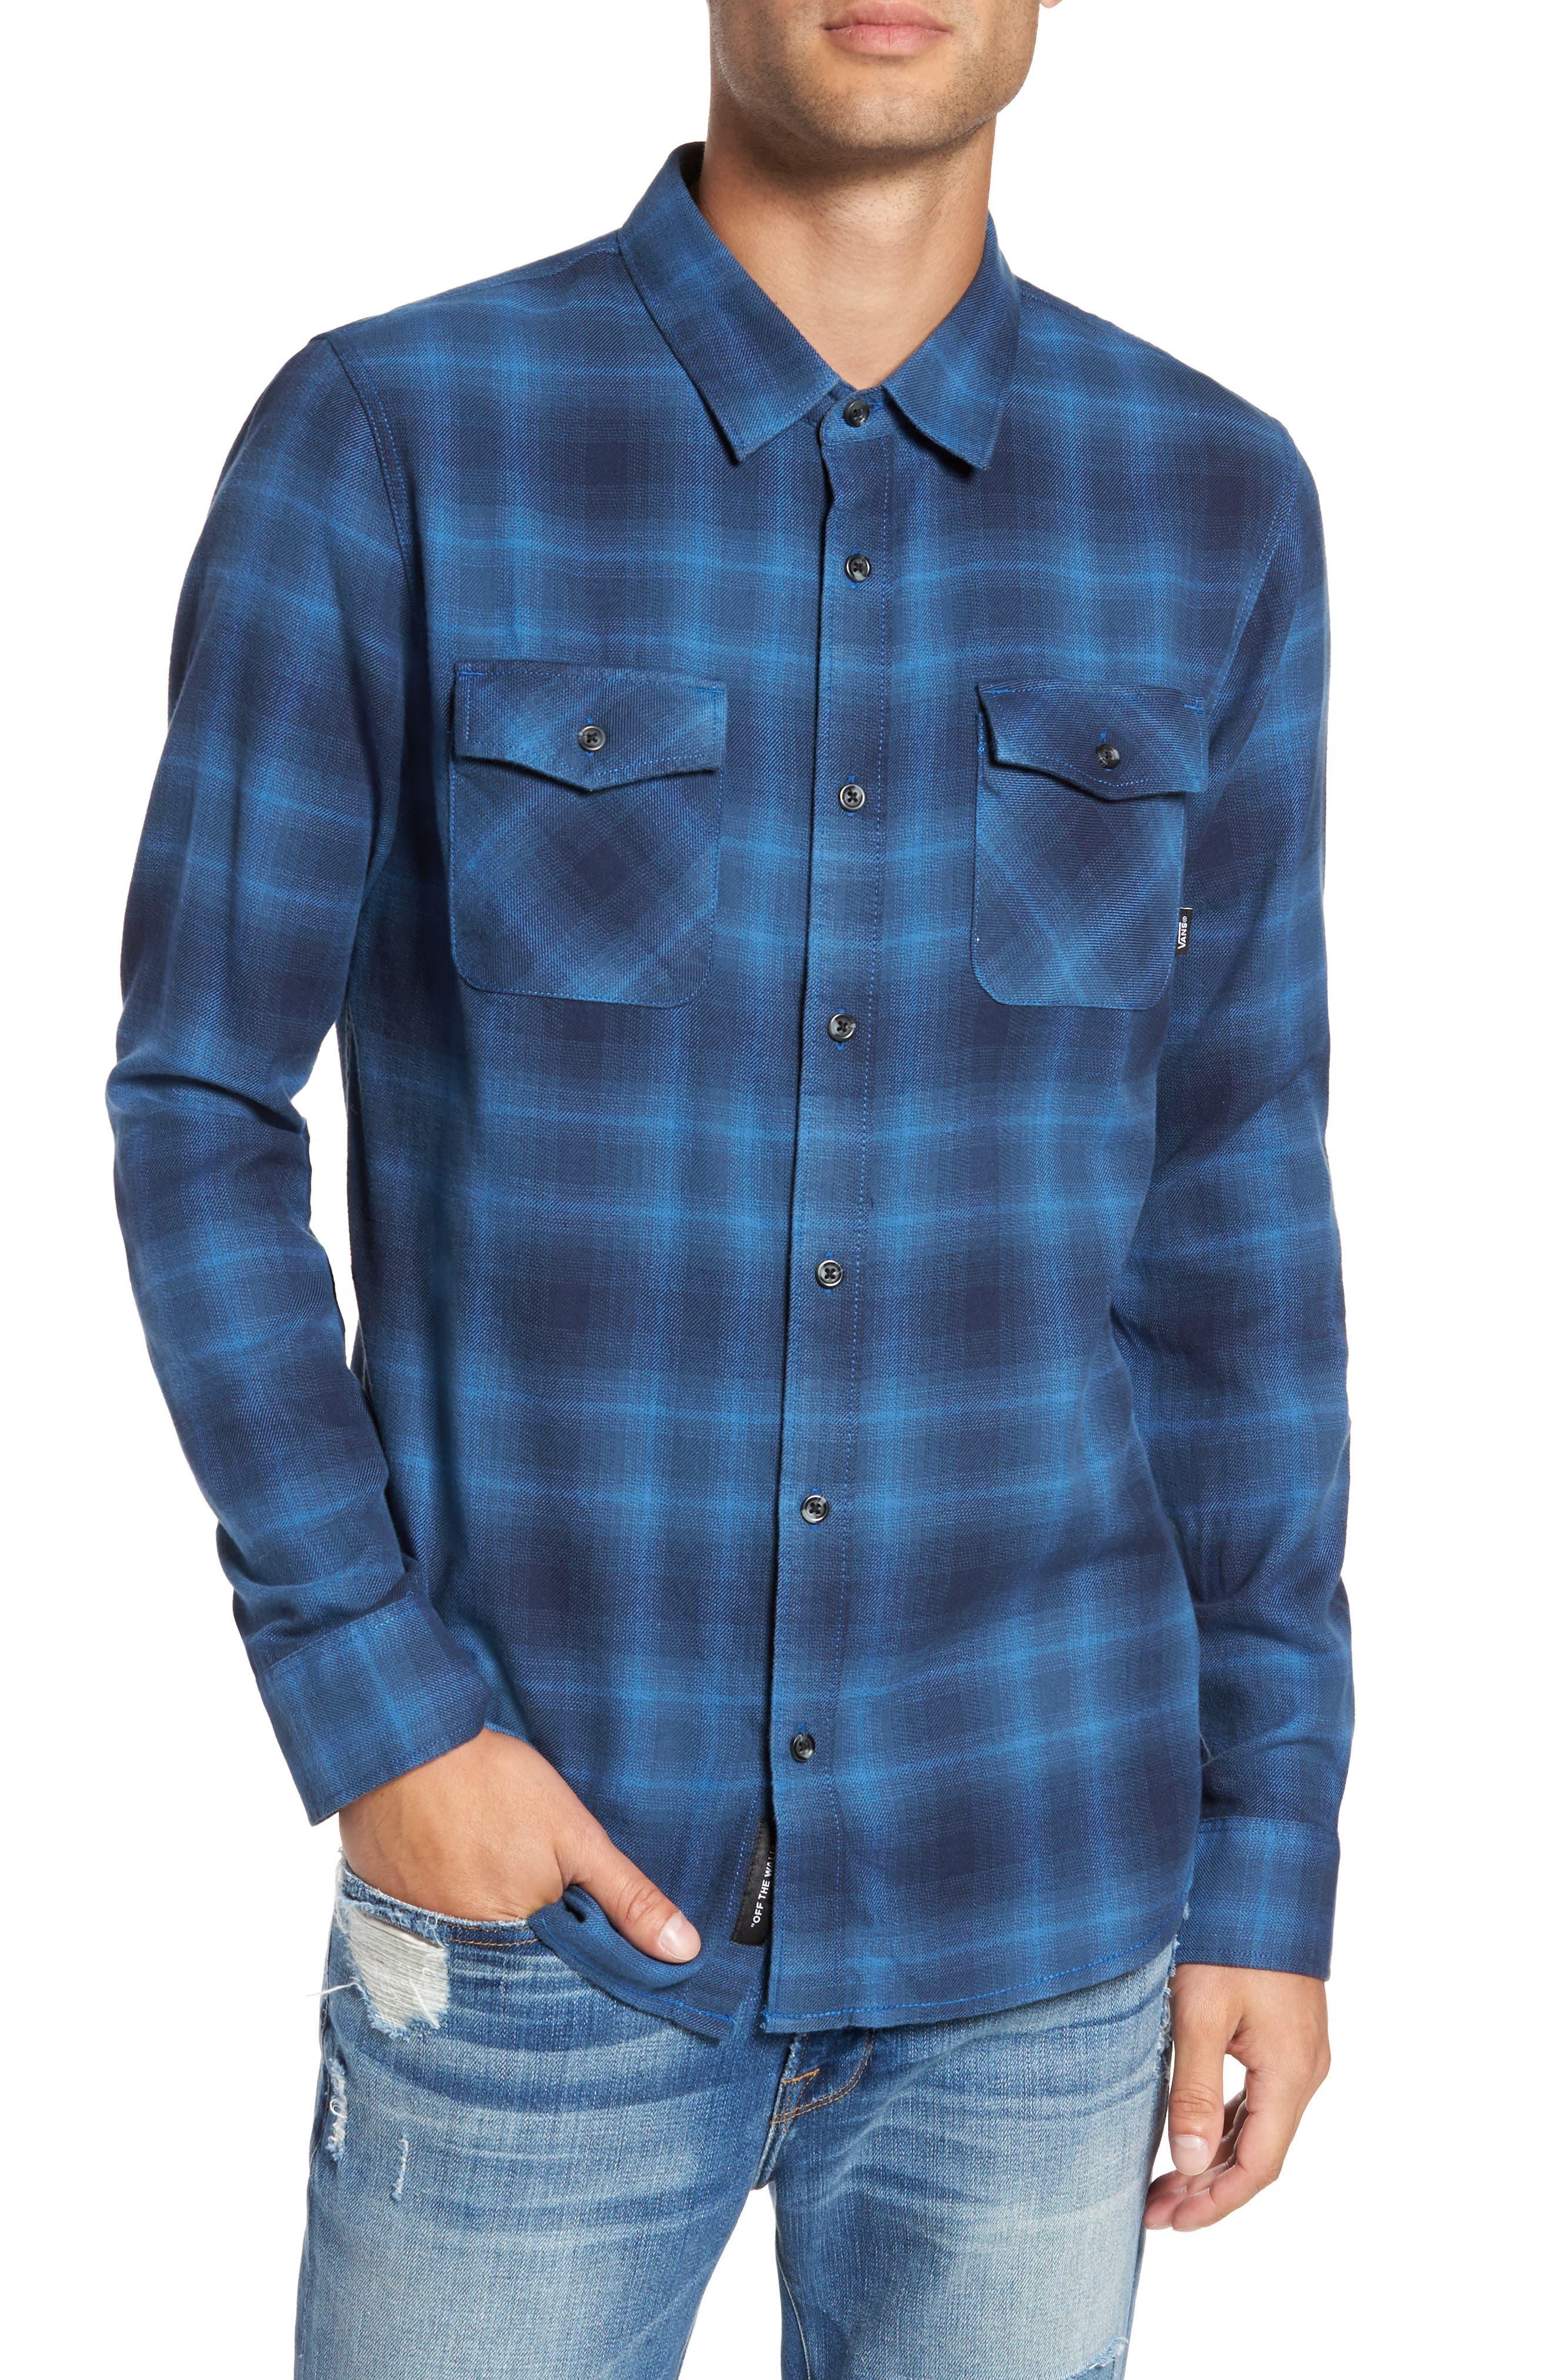 Alternate Image 1 Selected - Vans Monterey II Plaid Flannel Sport Shirt